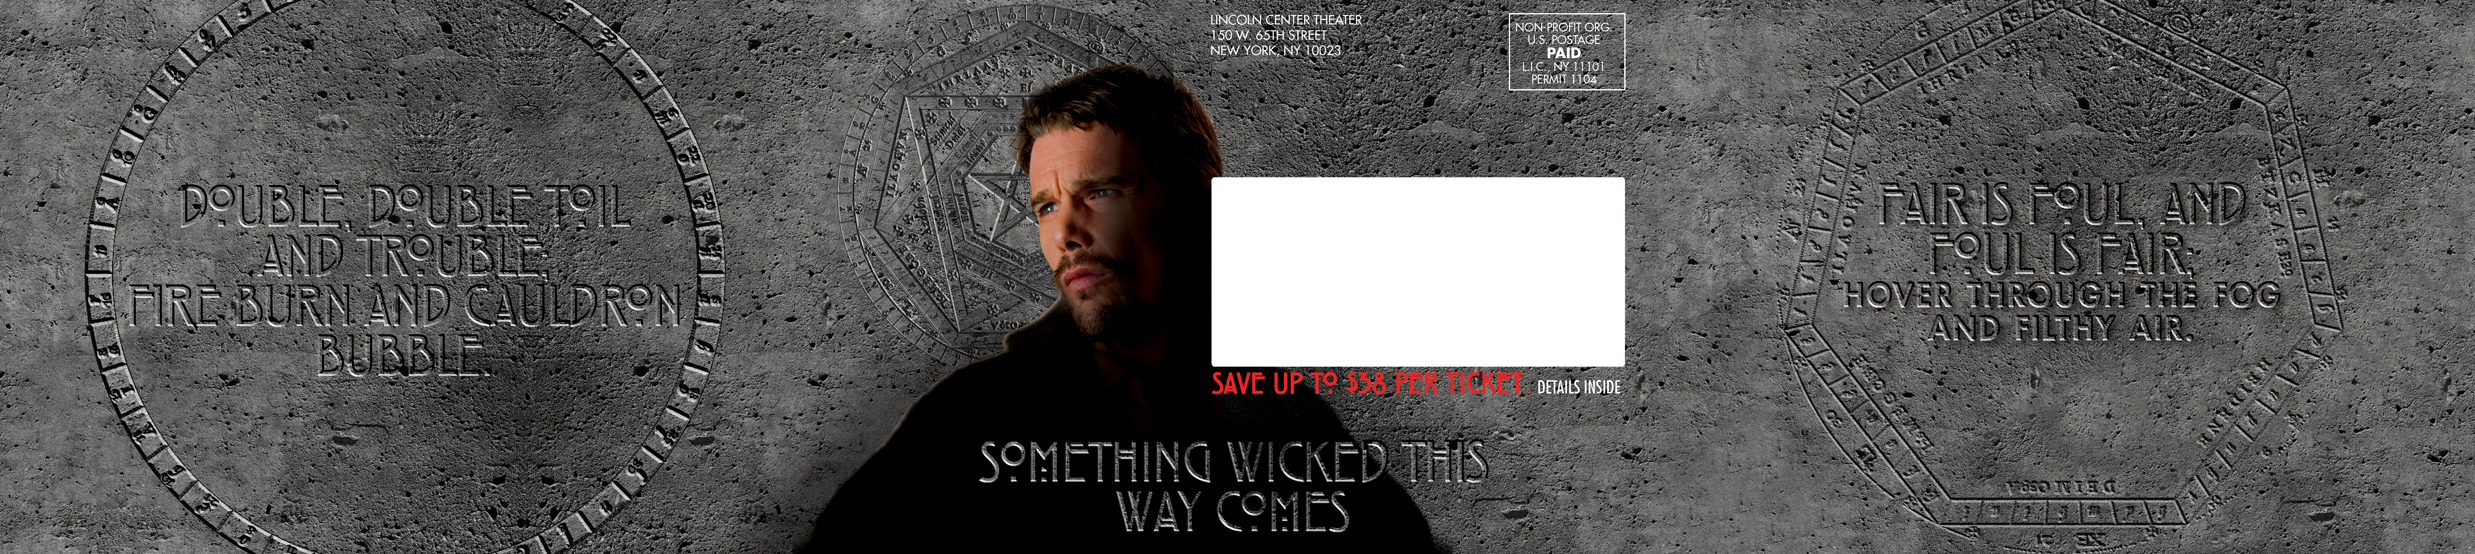 Macbeth Direct Mail